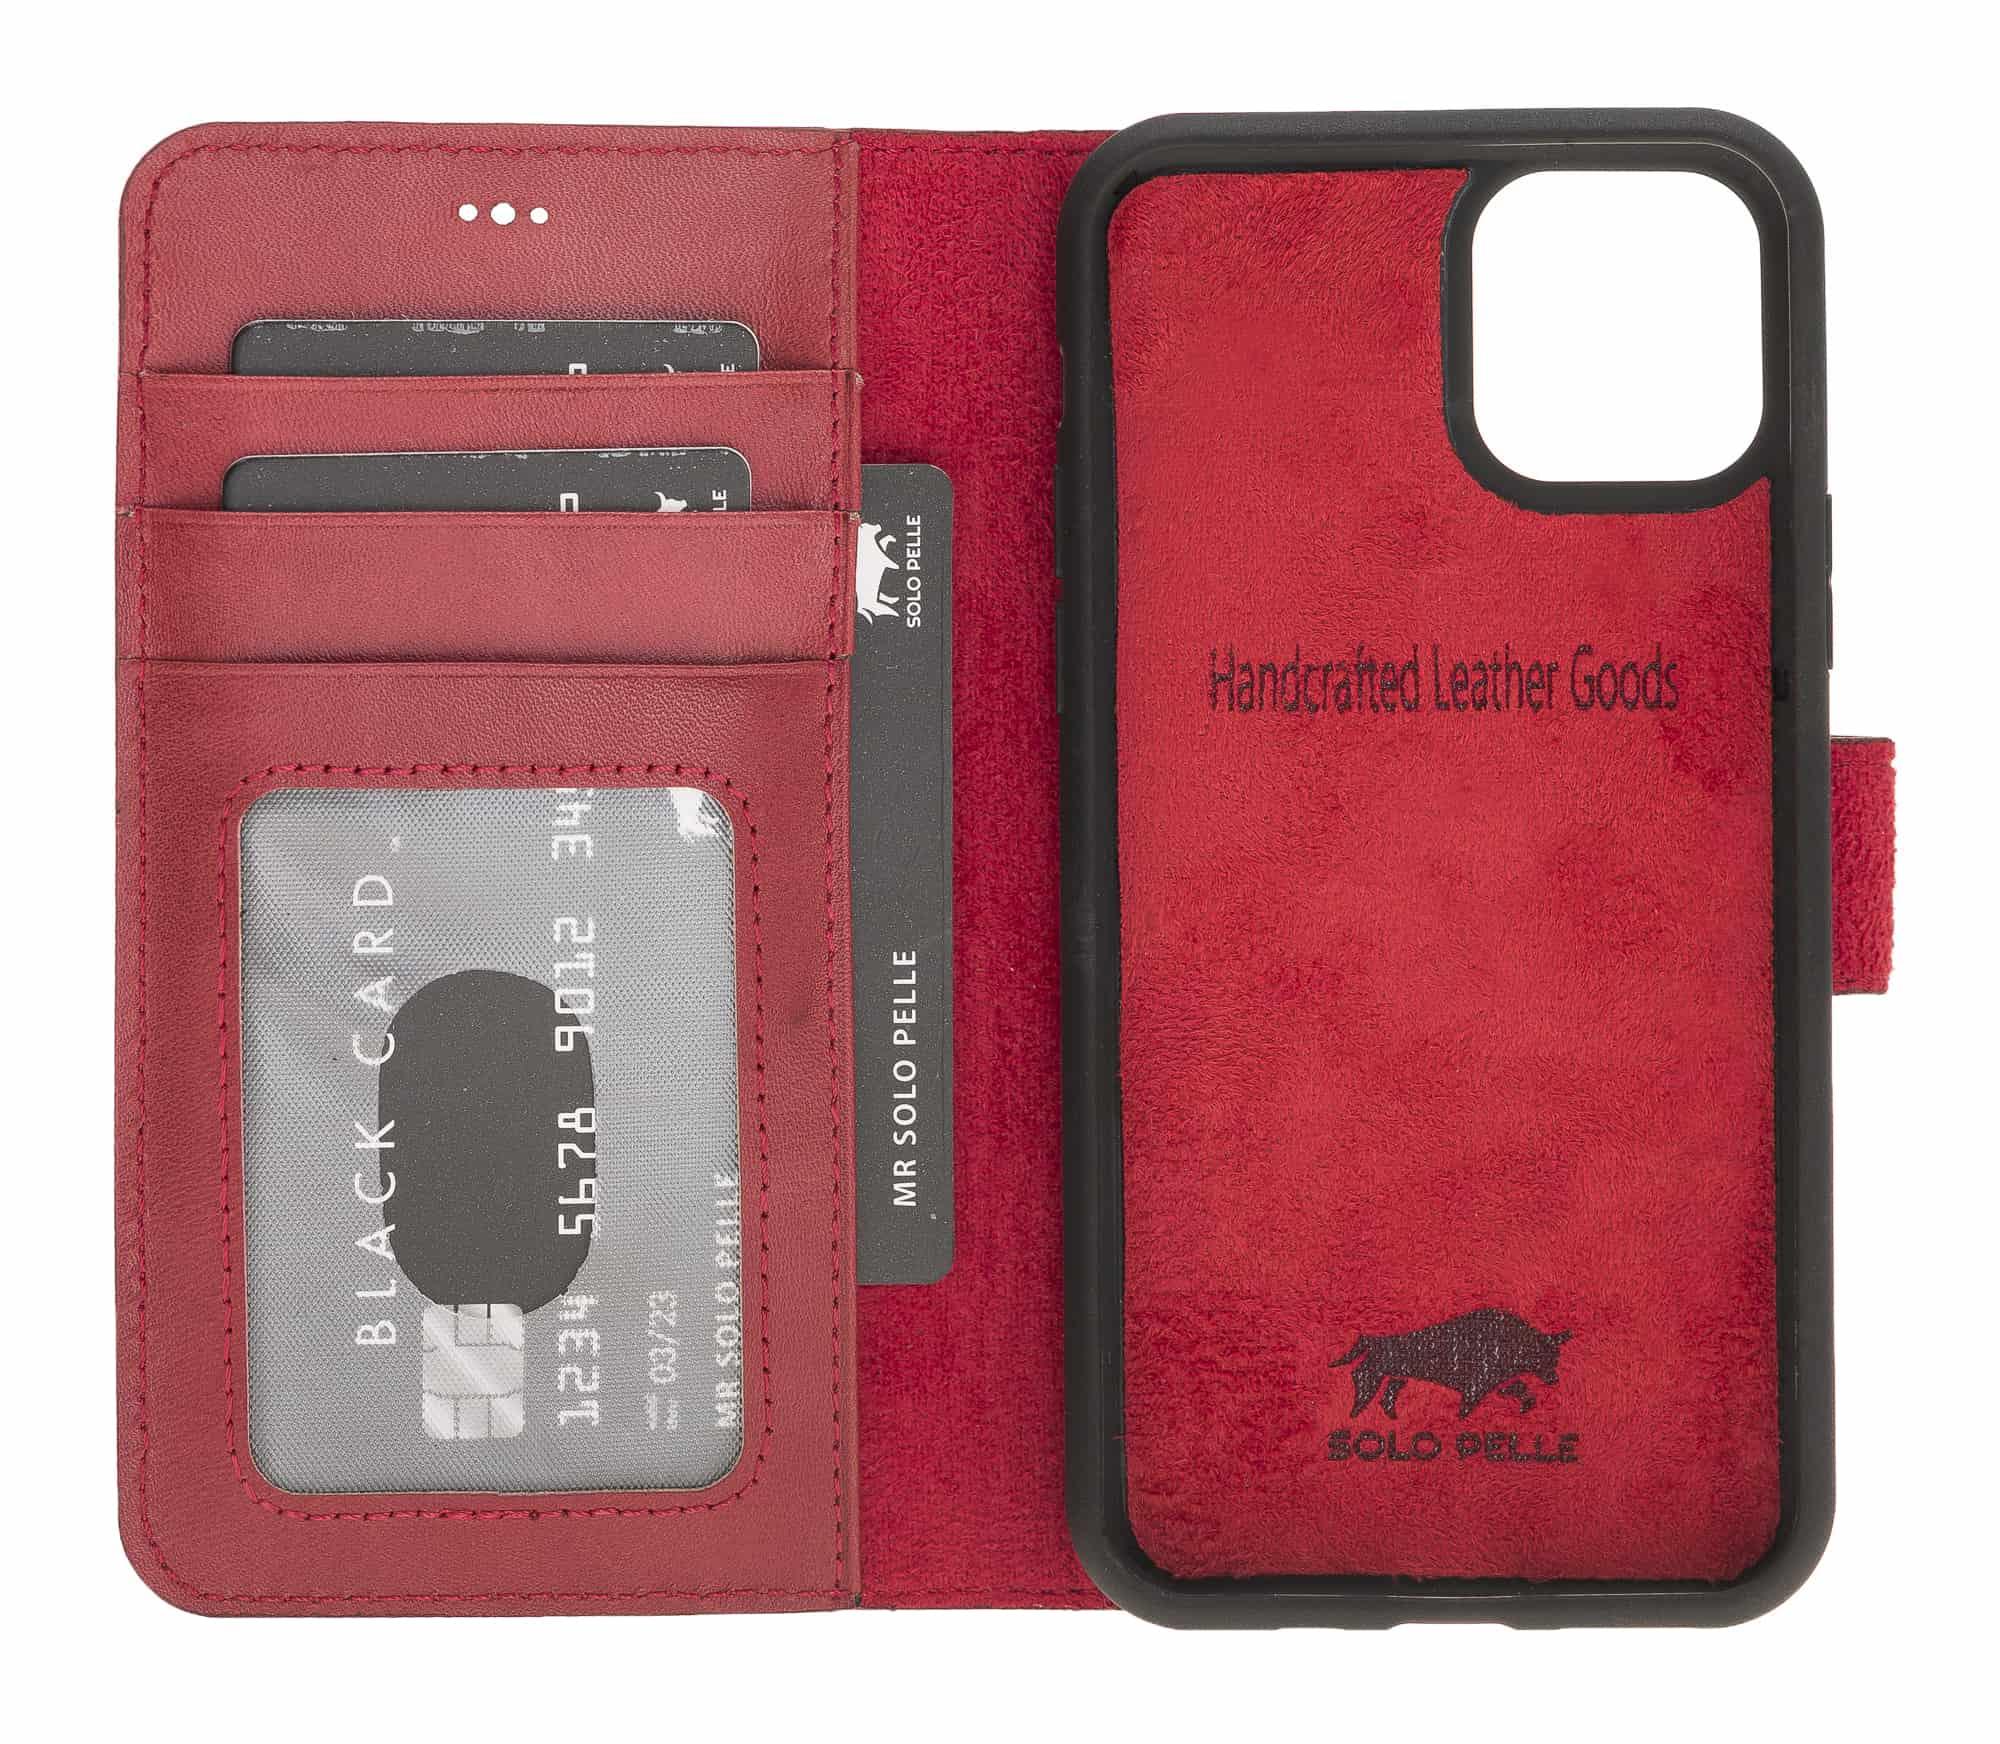 Solo Pelle Lederhülle kompatibel für iPhone 11 Pro Max 6.5 Zoll abnehmbare Hülle (2in1) inkl. Kartenfächer für das original Apple iPhone 11 Pro Max (Rot Burned)